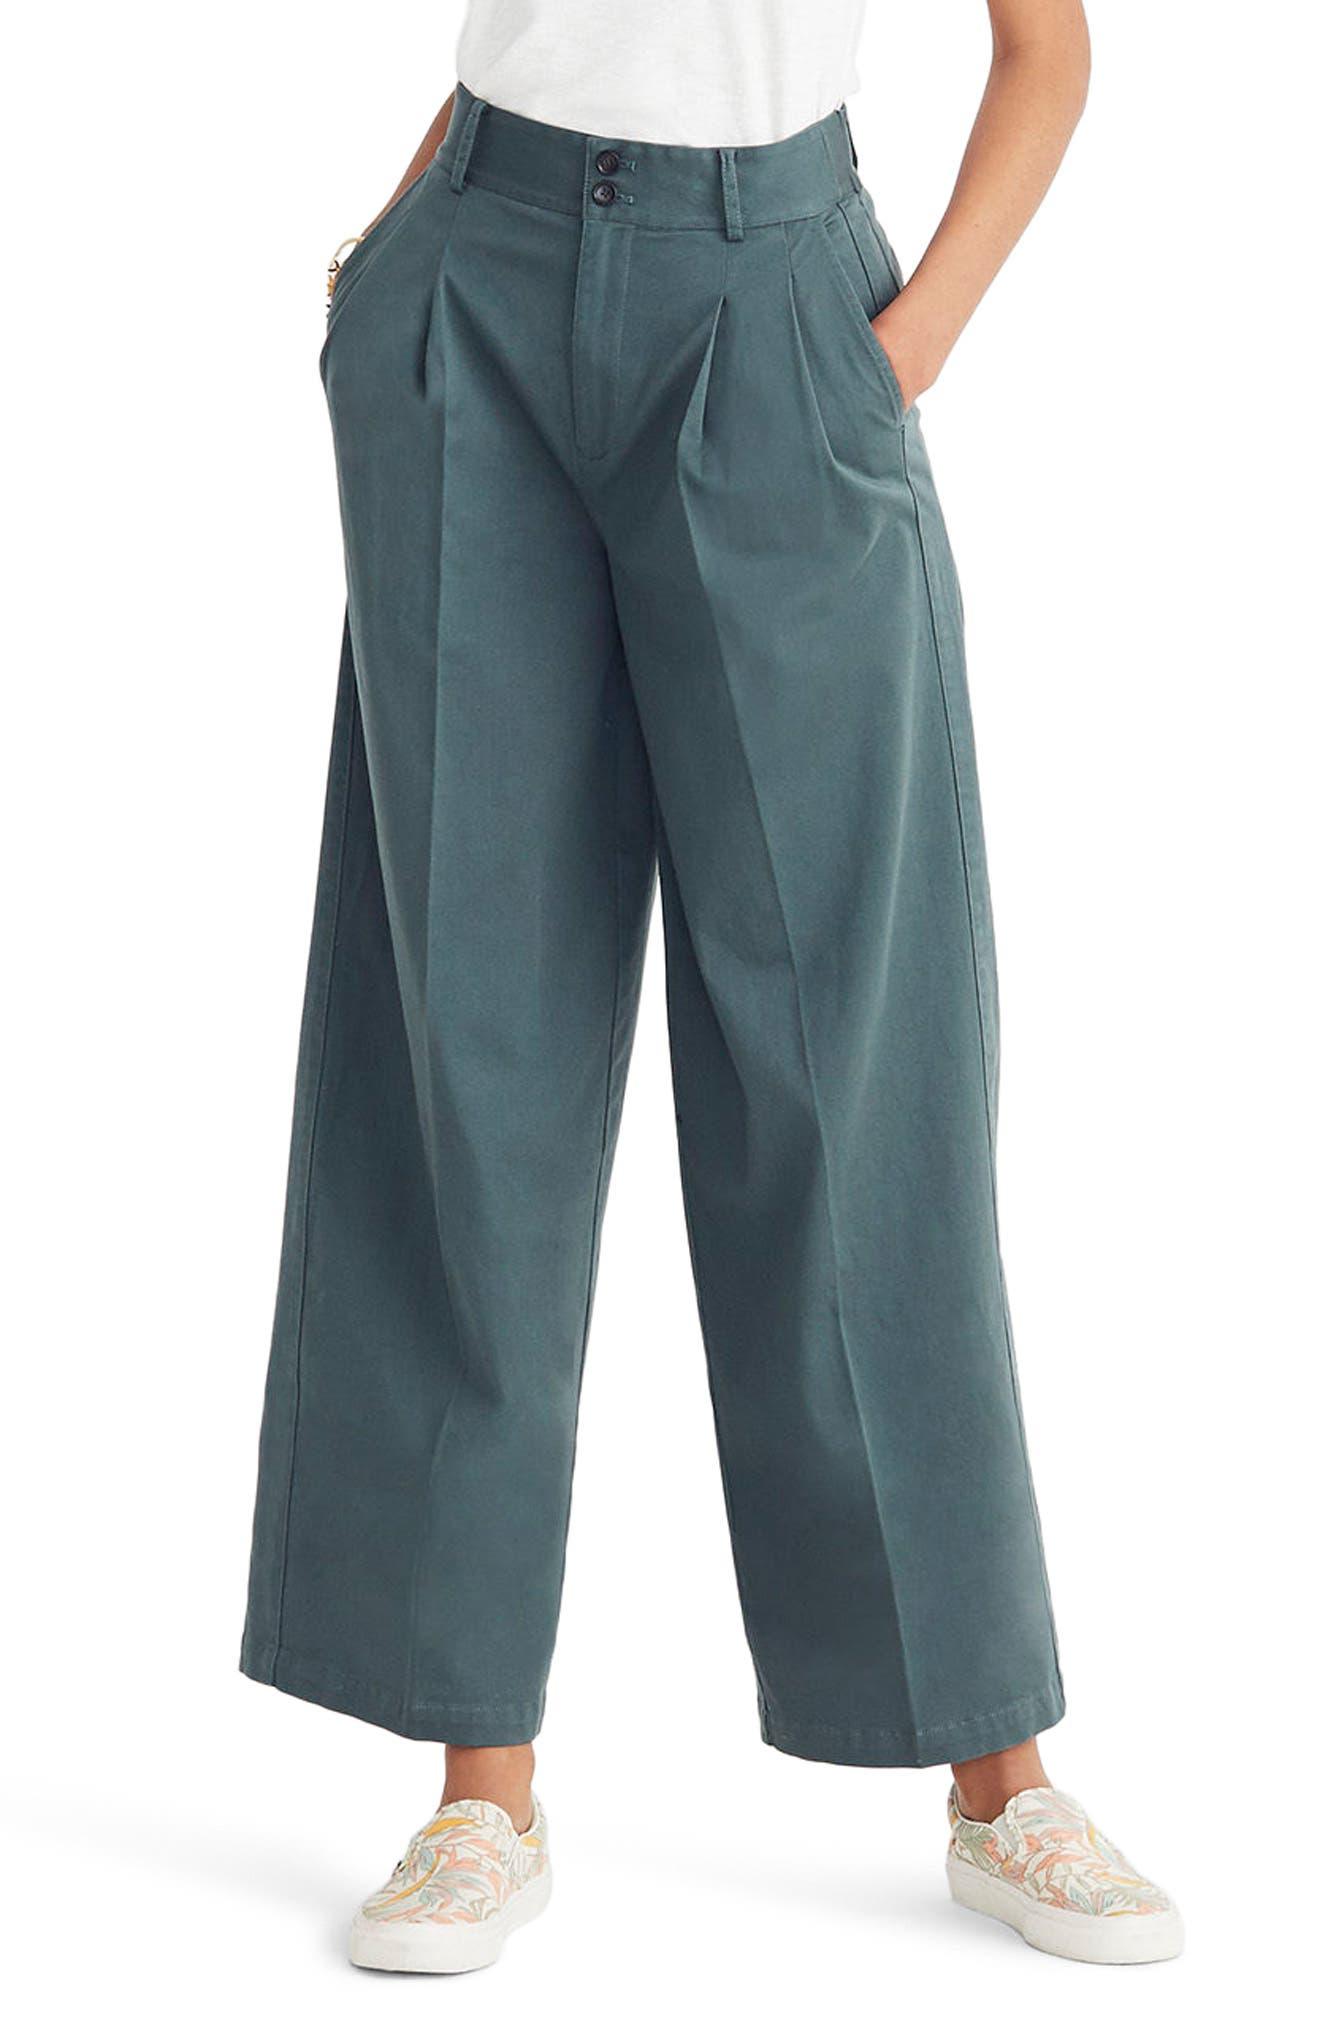 High Waist Crop Wide Leg Pants,                             Main thumbnail 1, color,                             Architect Green